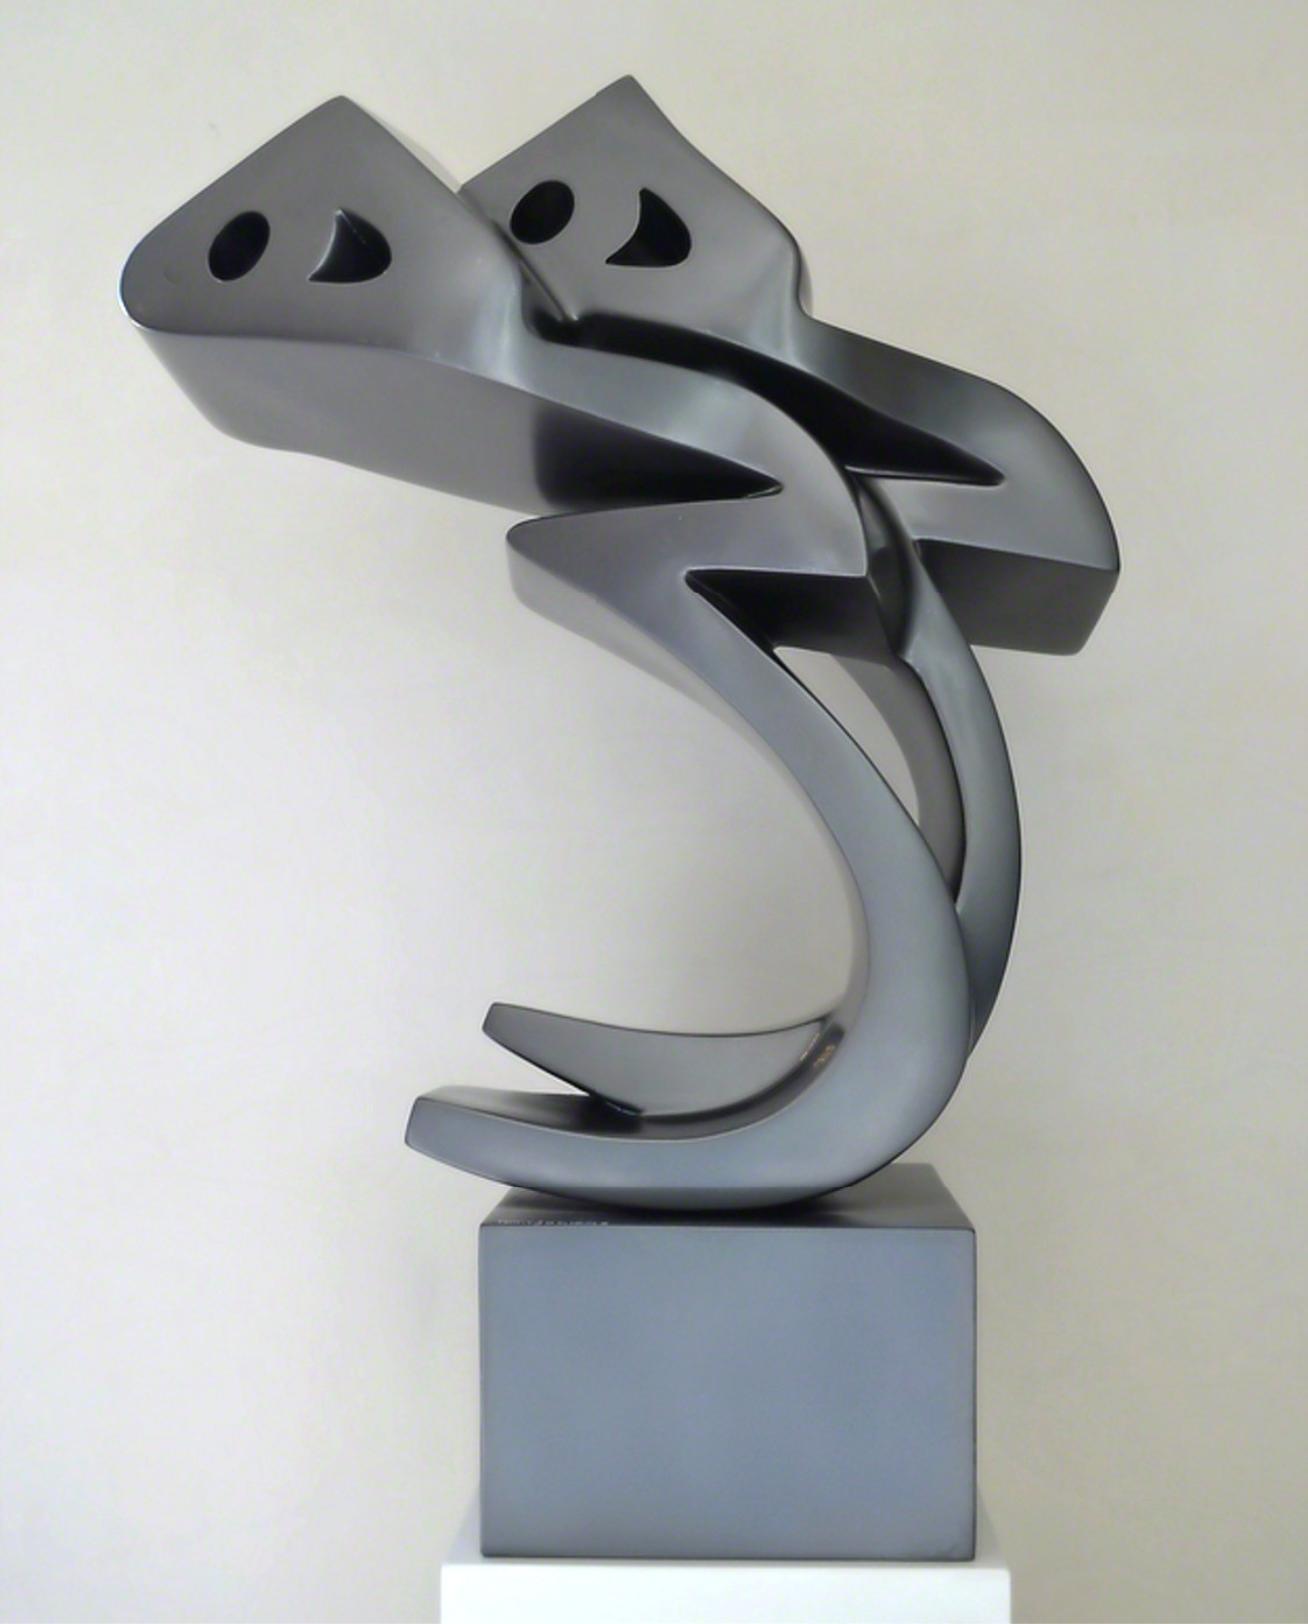 Parviz Tanavoli, Heech Lovers, fiberglass, 106 x 41 x 35 cm, 2010